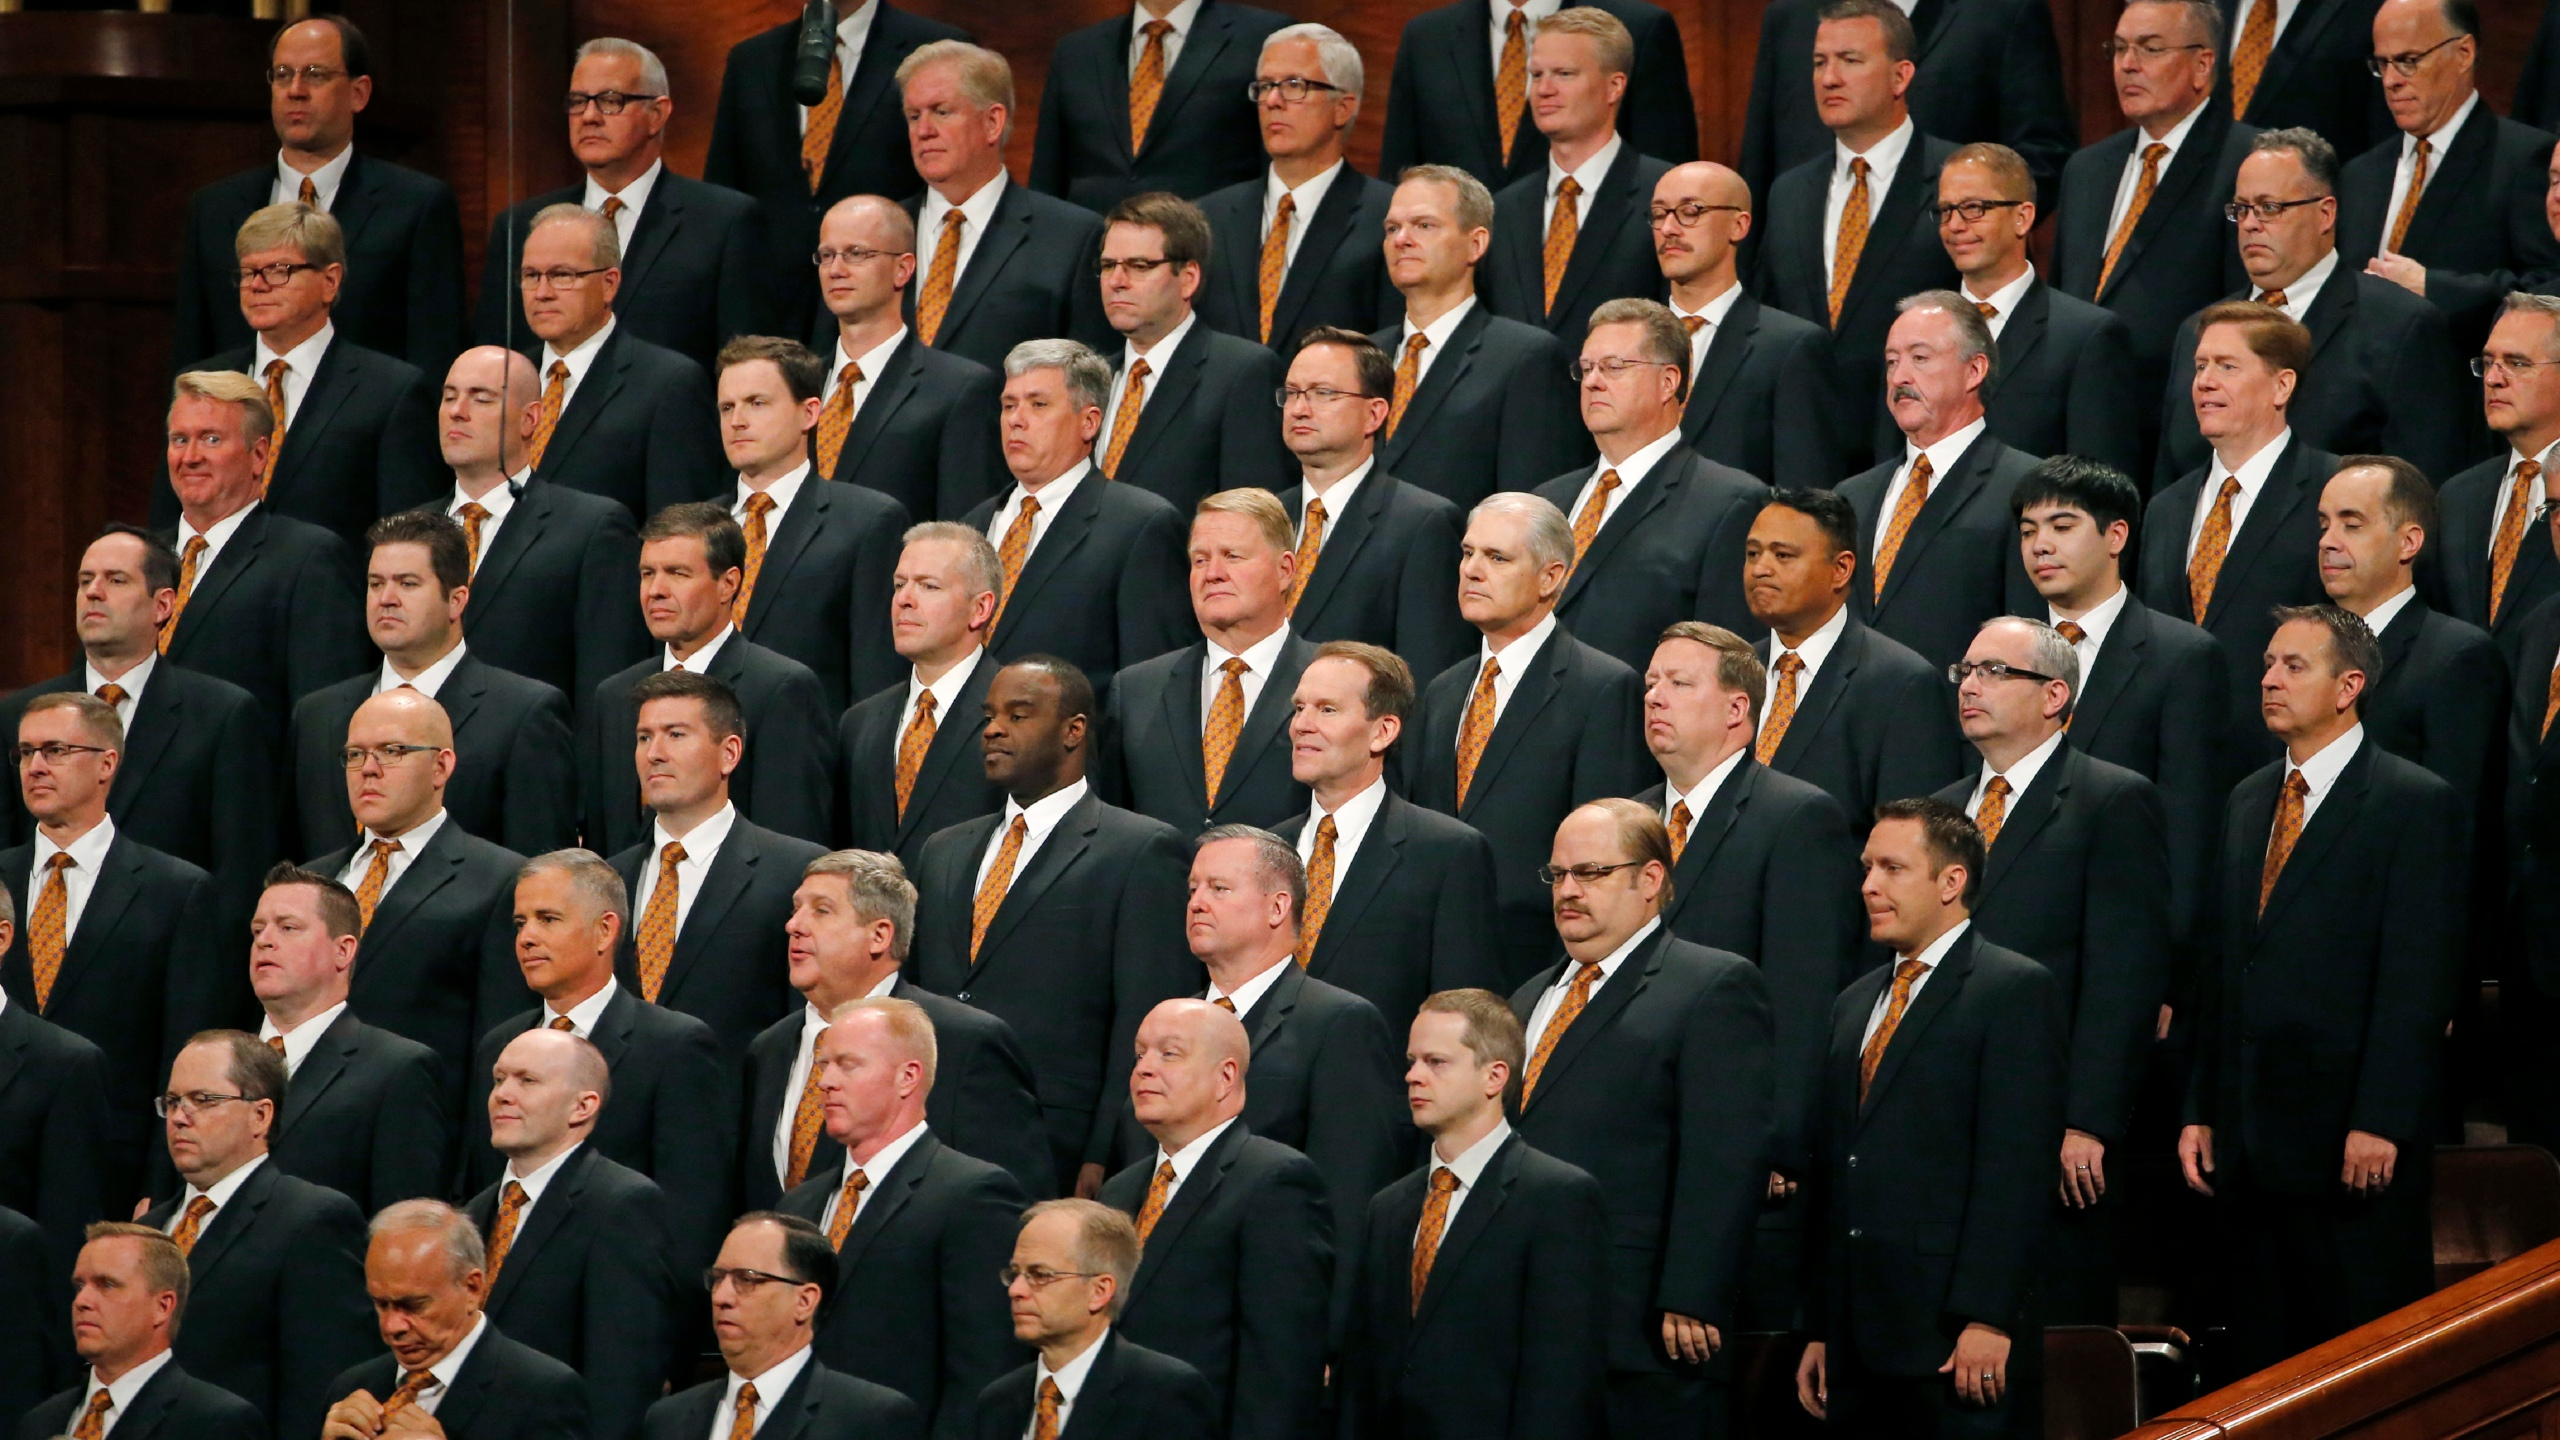 Lds Christmas Concert 2020 Televison Schedule Mormon choir Christmas concert cancelled due to pandemic | WSAV TV